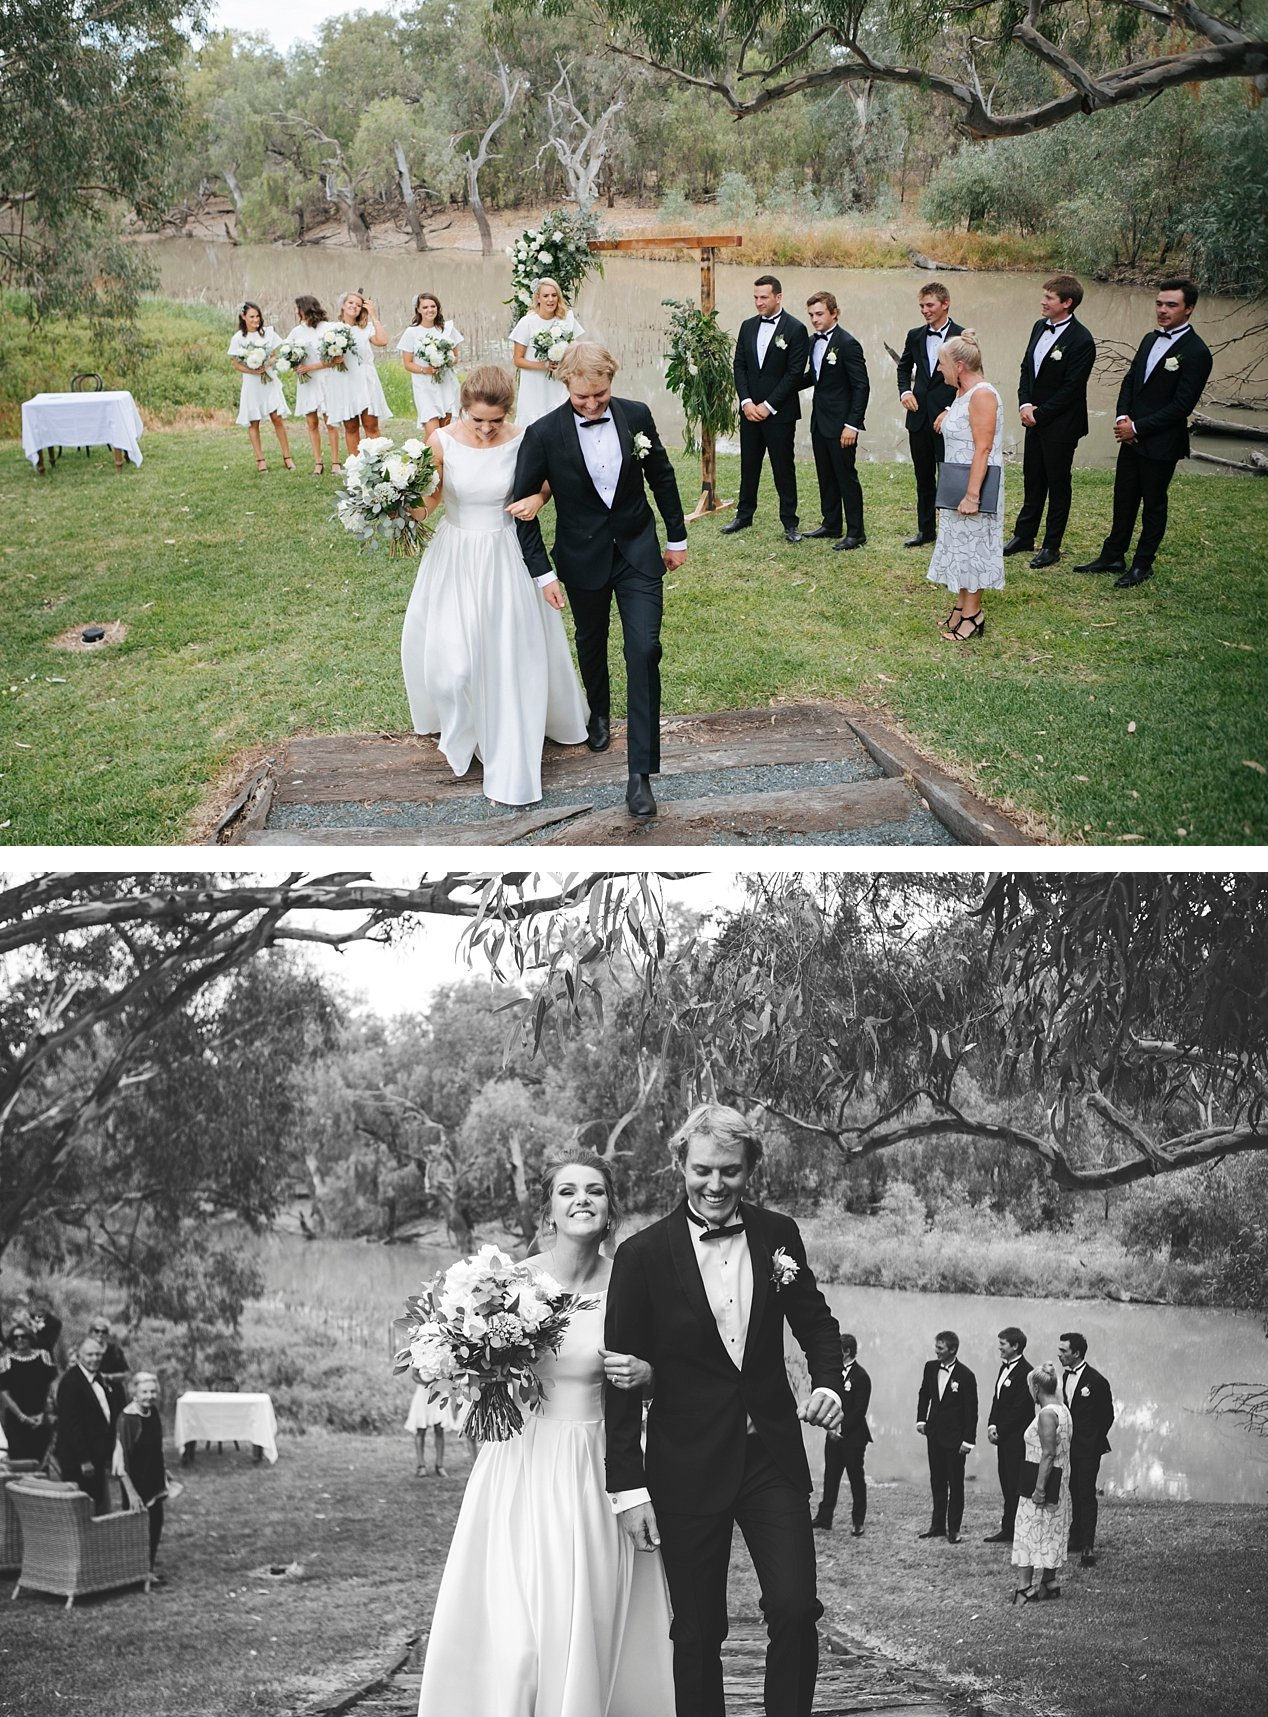 Jerilderie Wedding by Wagga Wagga Wedding Photographer Peppermint Studios_Deniliquin weddings_0064